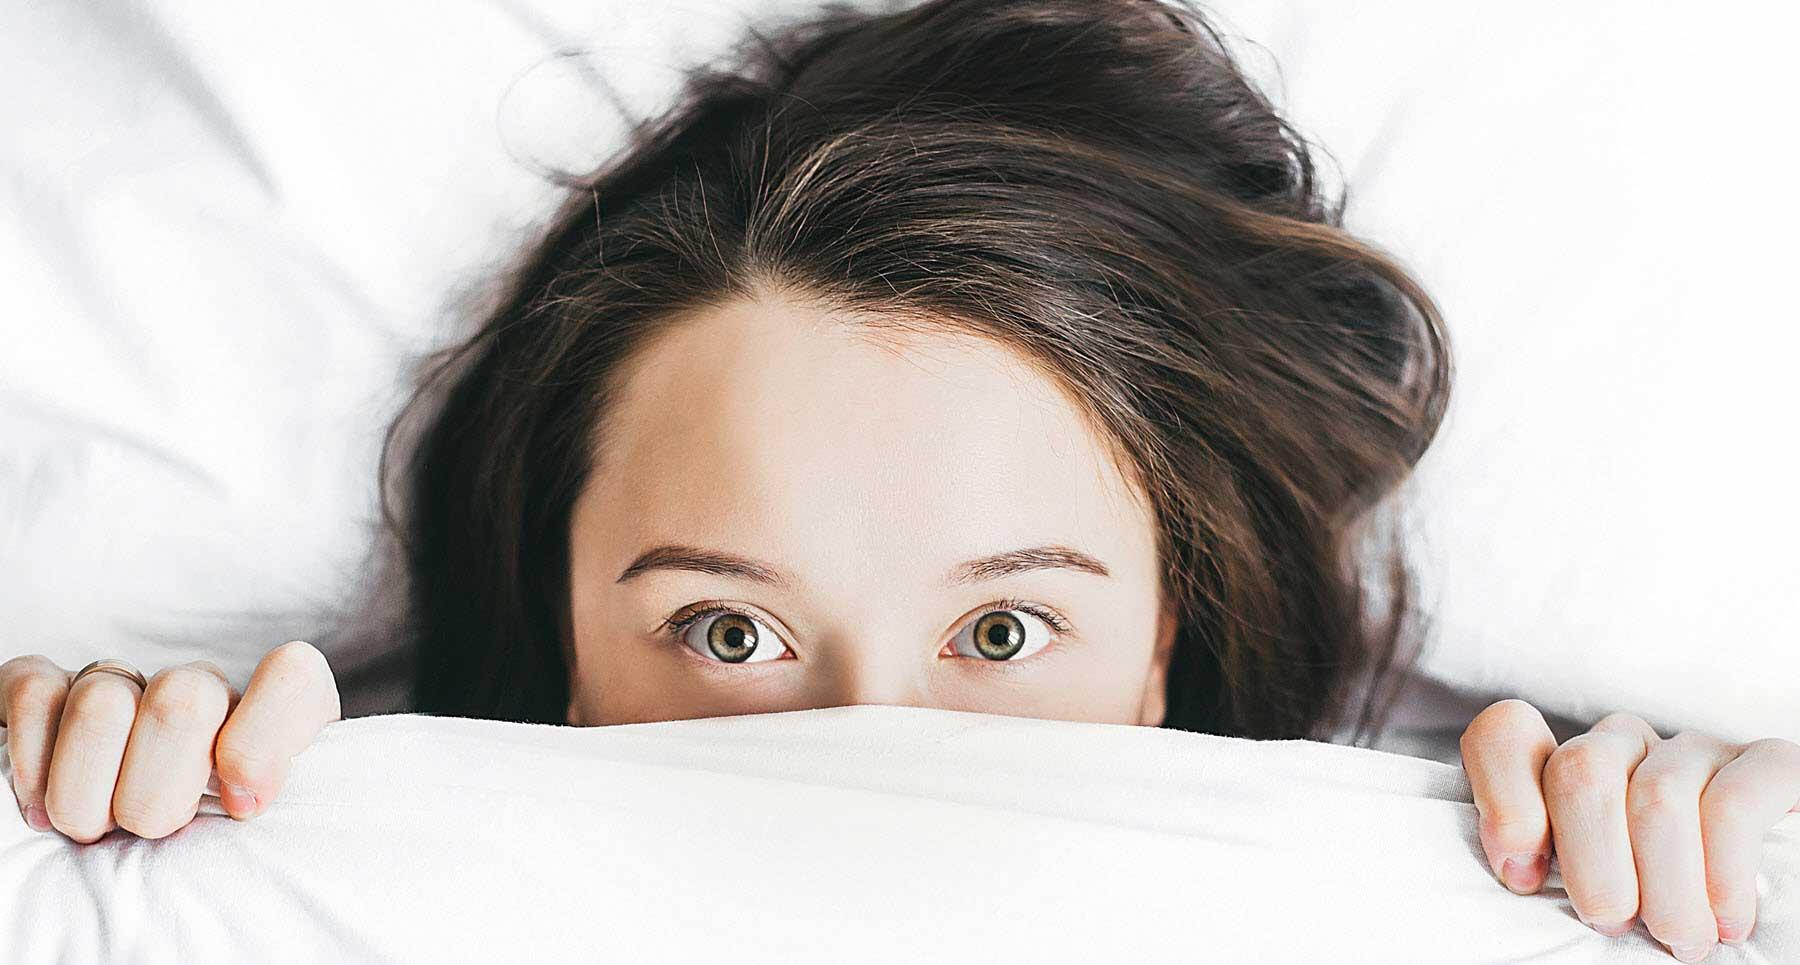 girl-awake-at-night-overthinking and sabotaging your relationships